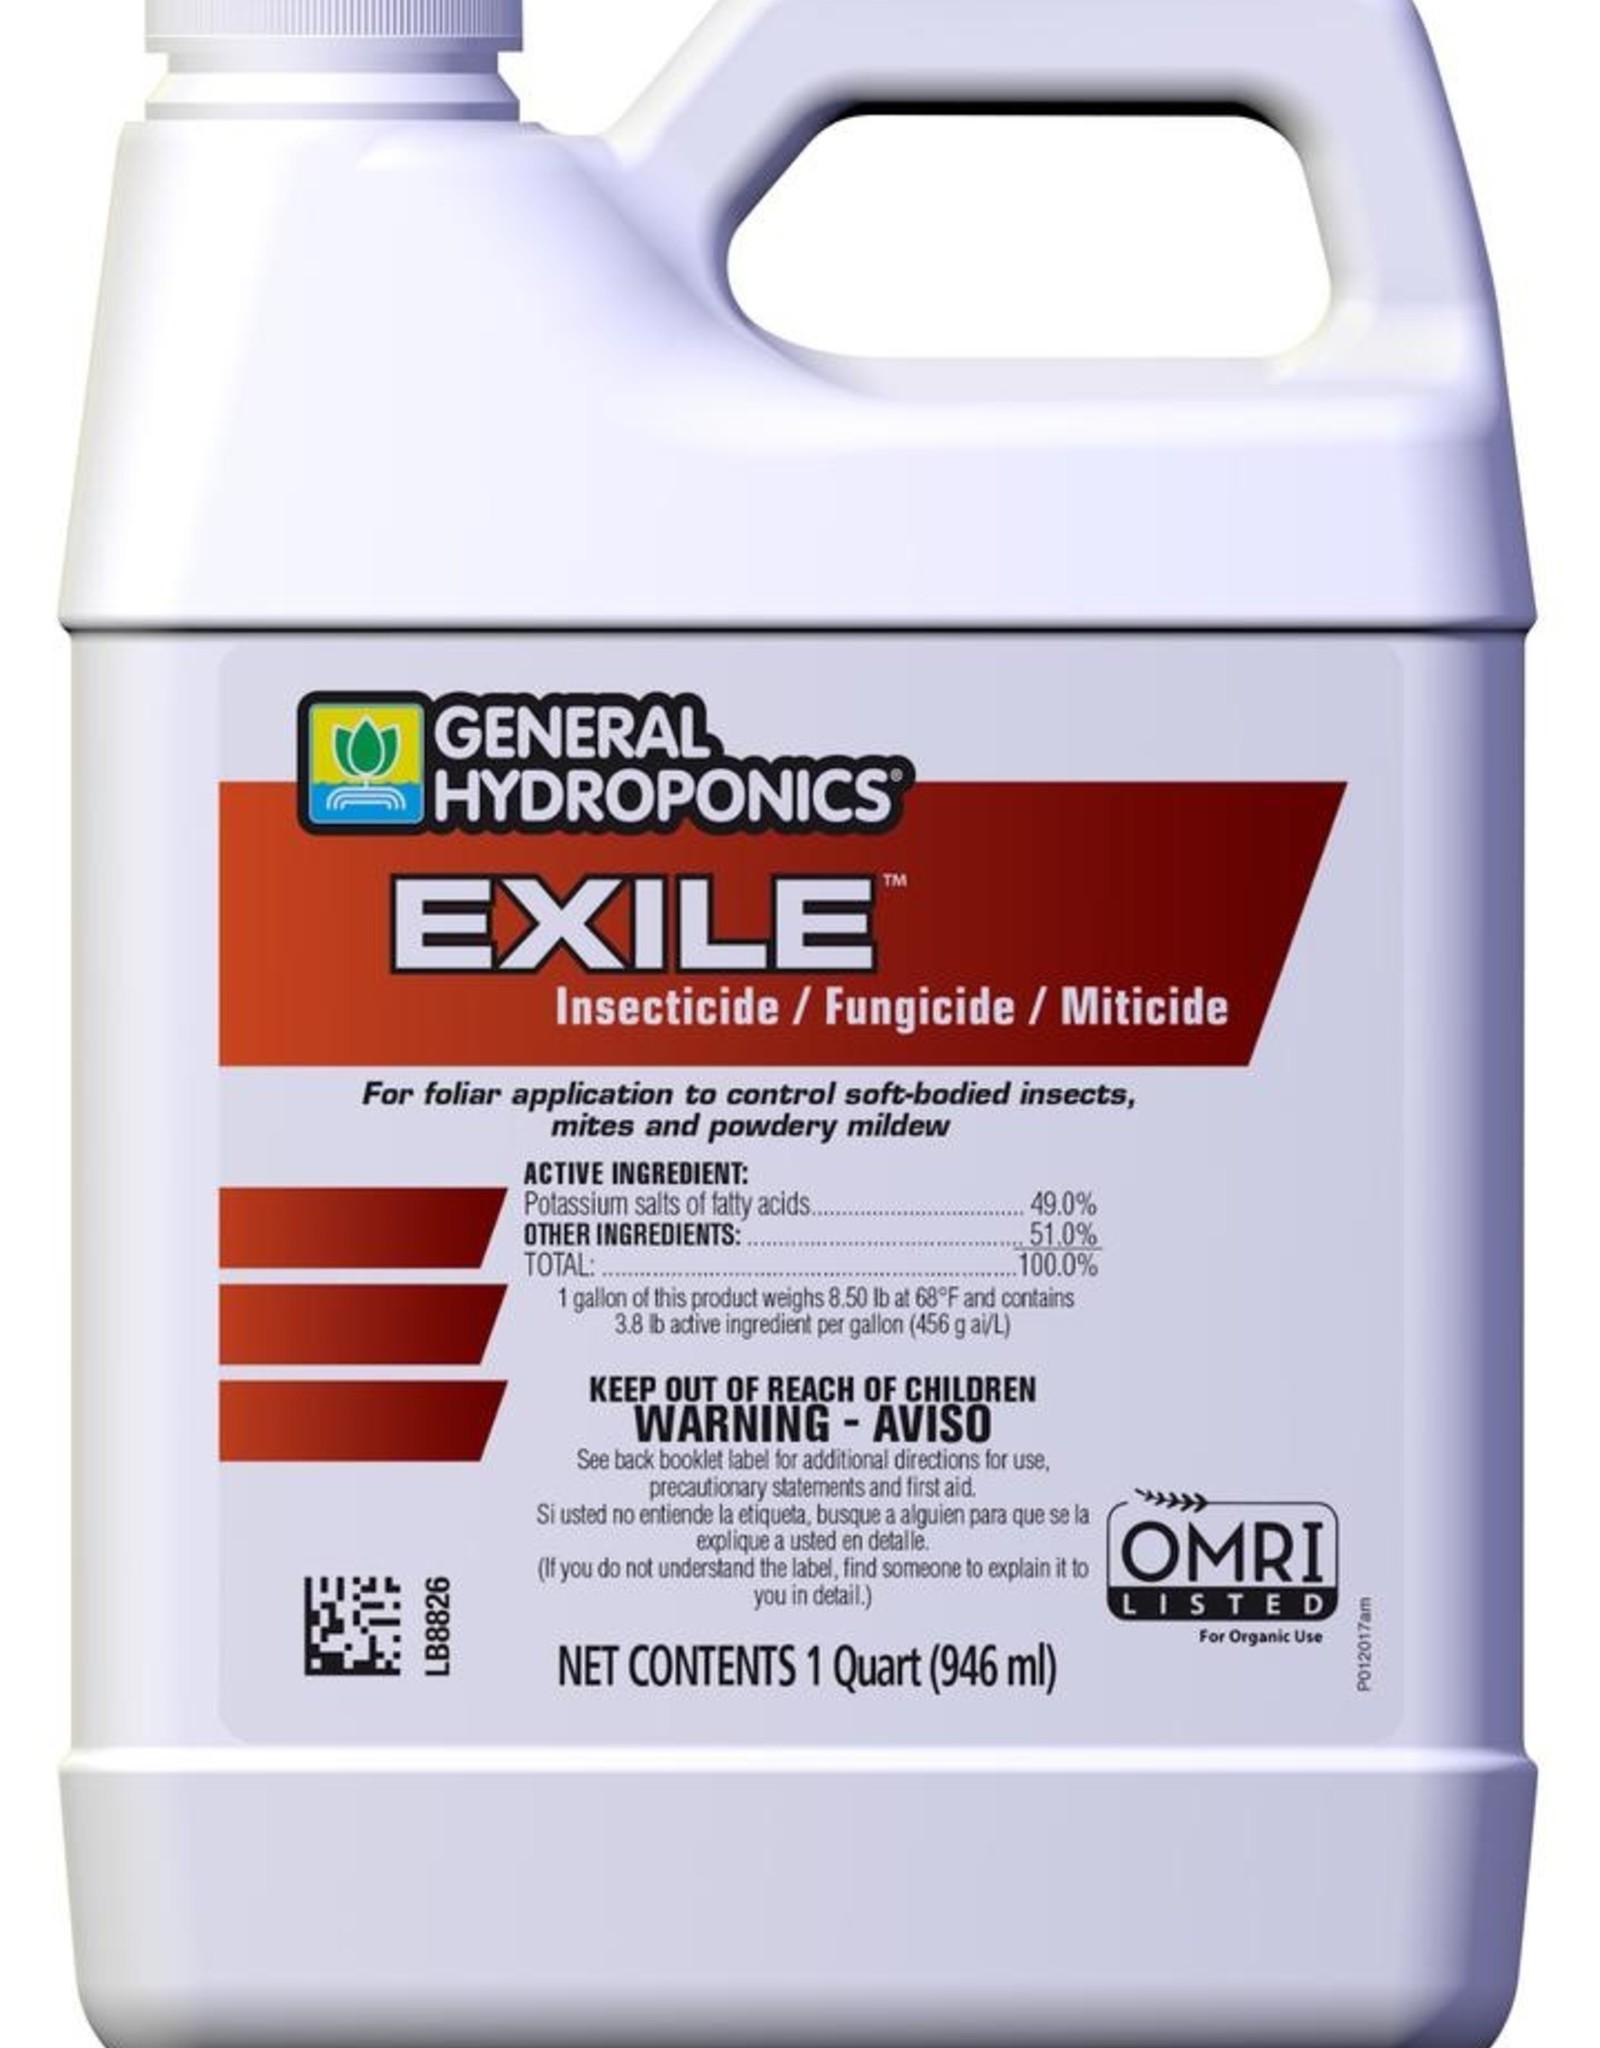 GENERAL HYDROPONICS GH Exile Insecticide / Fungicide / Miticide Quart